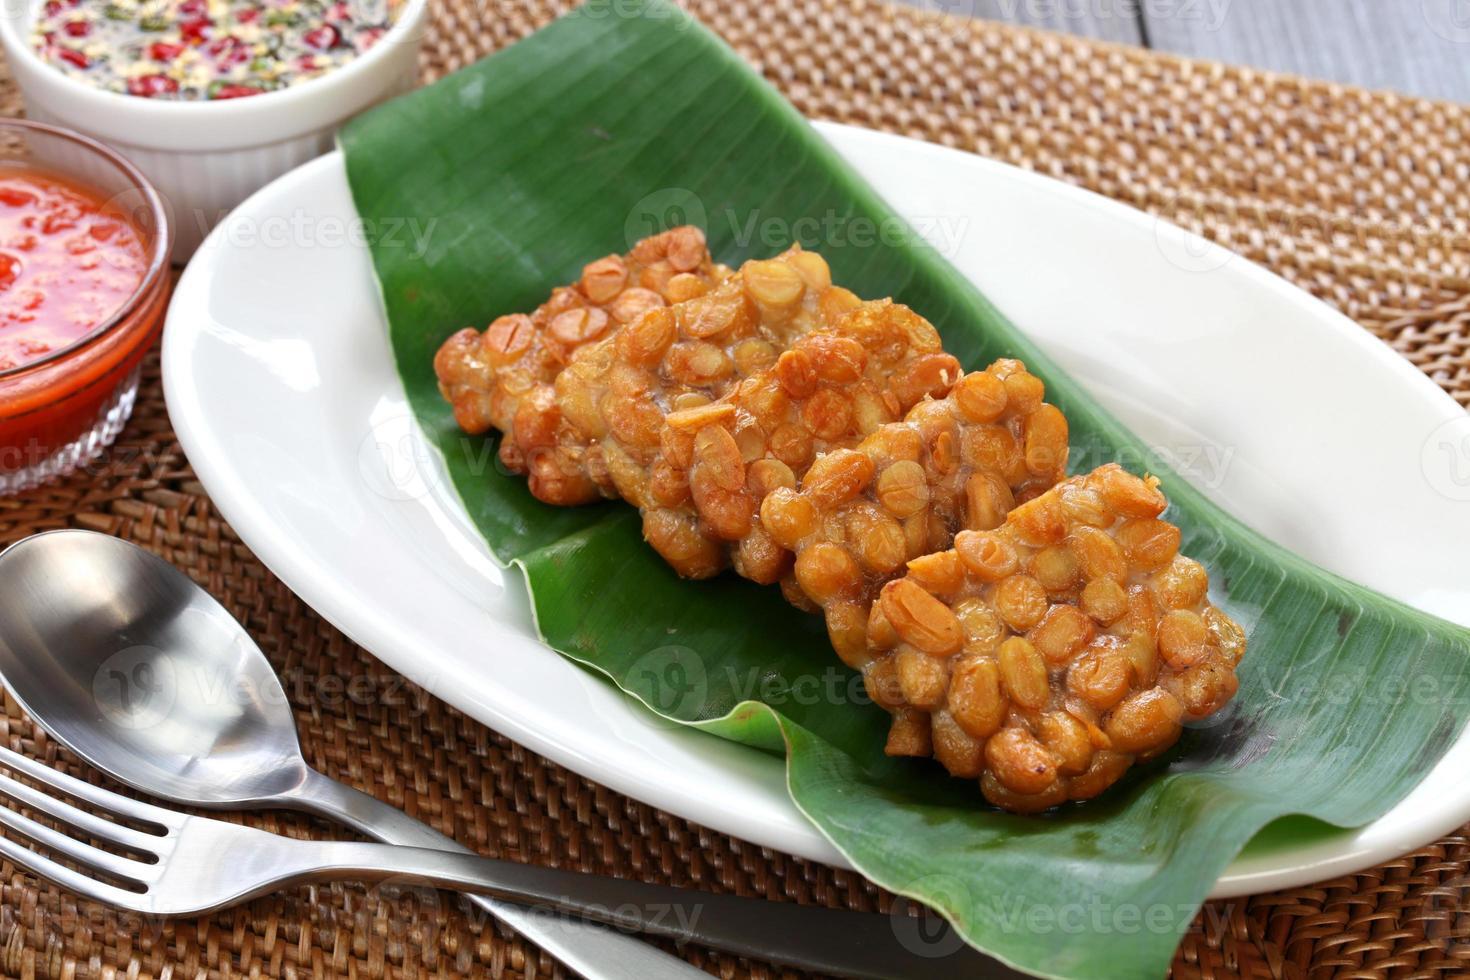 tempe goreng, tempeh fritto, cibo vegetariano indonesiano foto